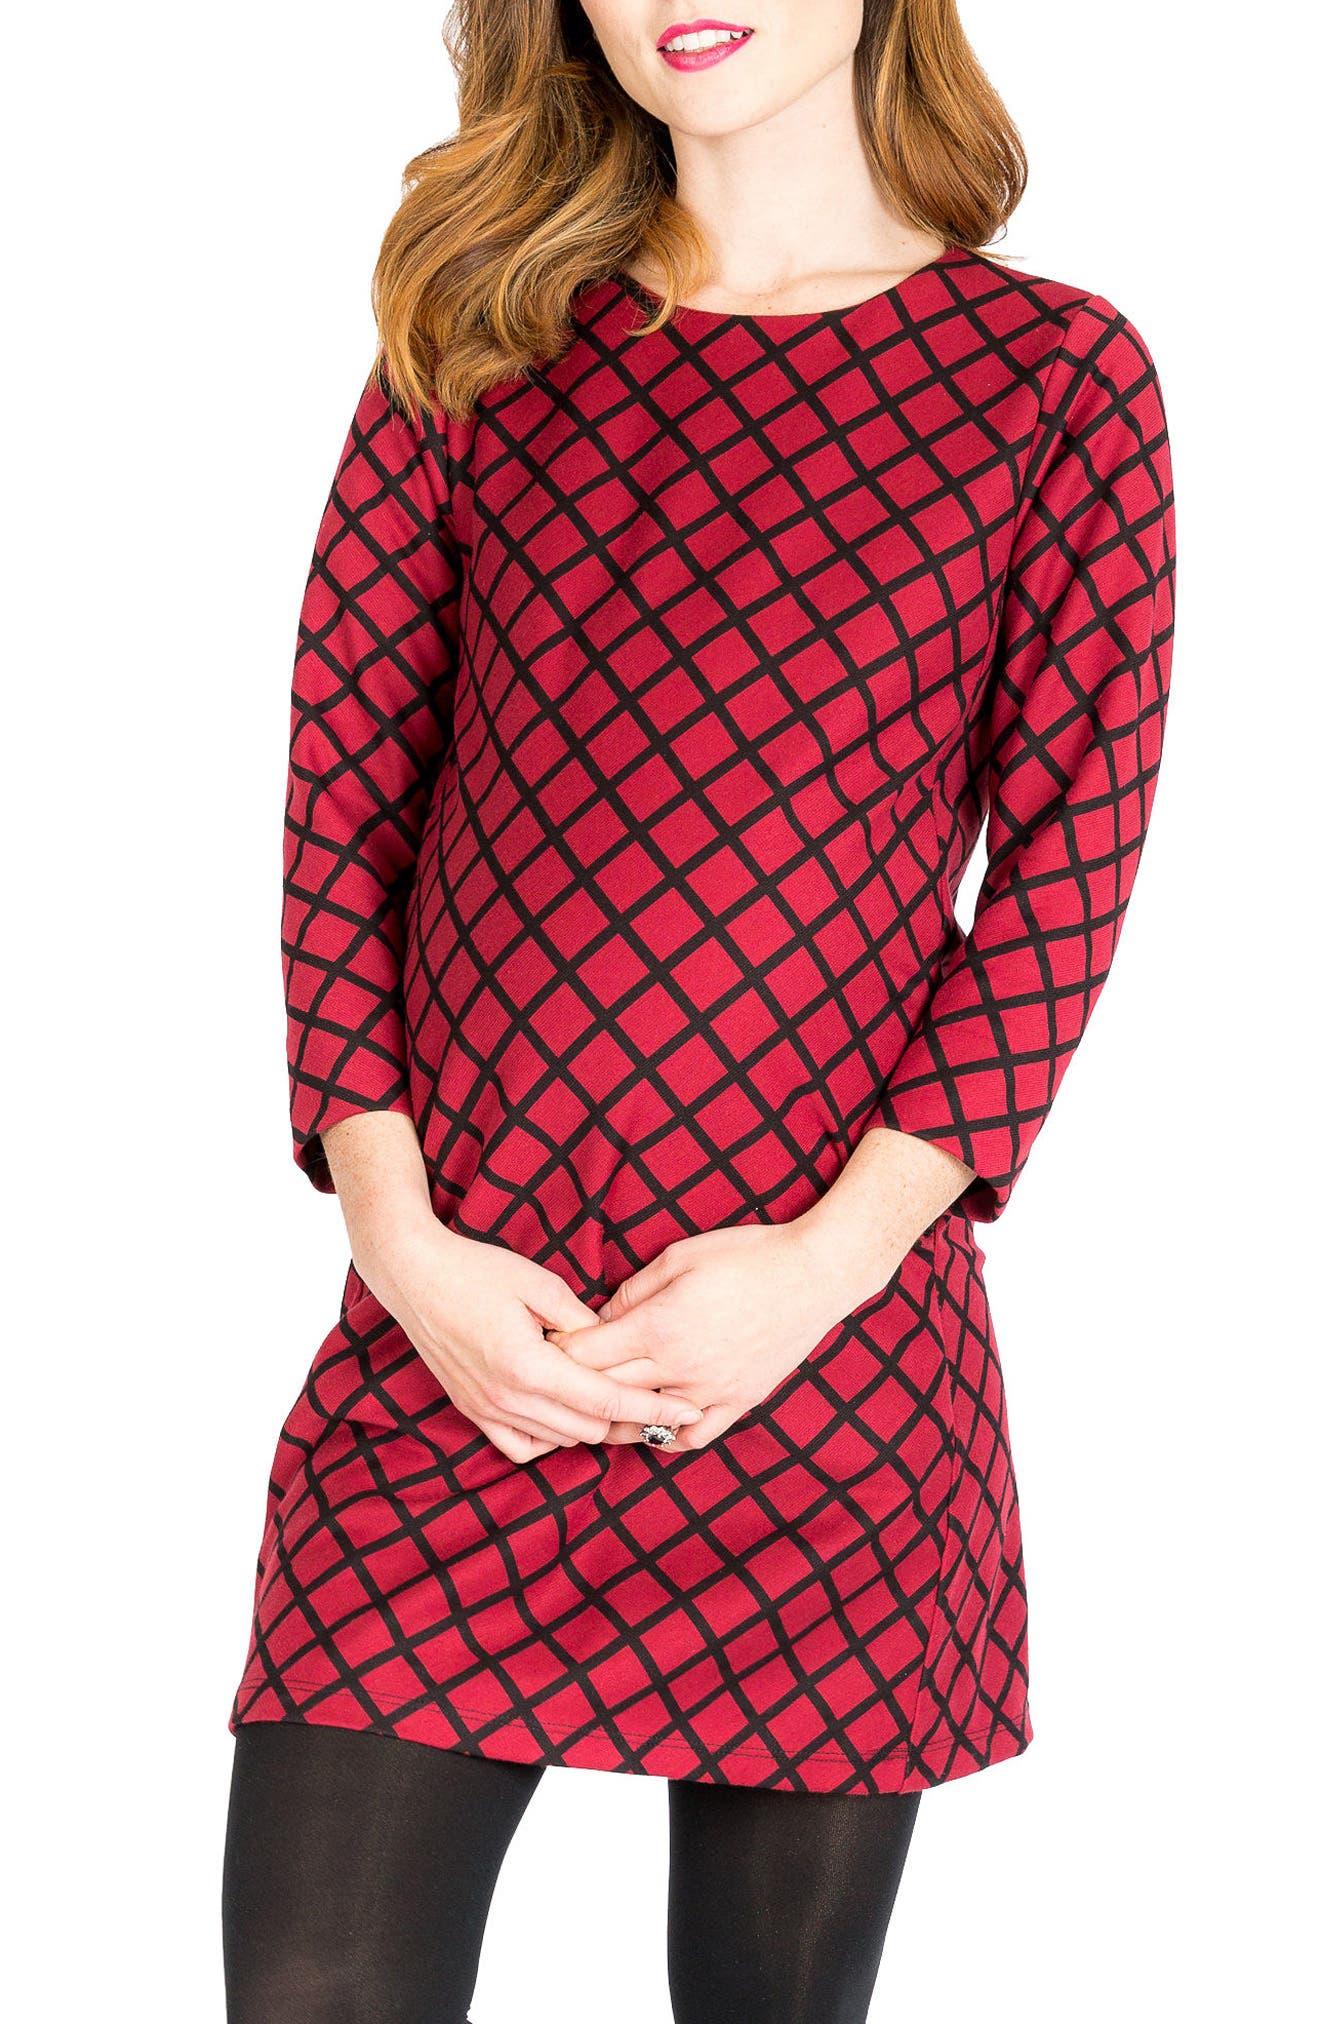 Alternate Image 1 Selected - Nom Maternity Charlotte Maternity Tunic